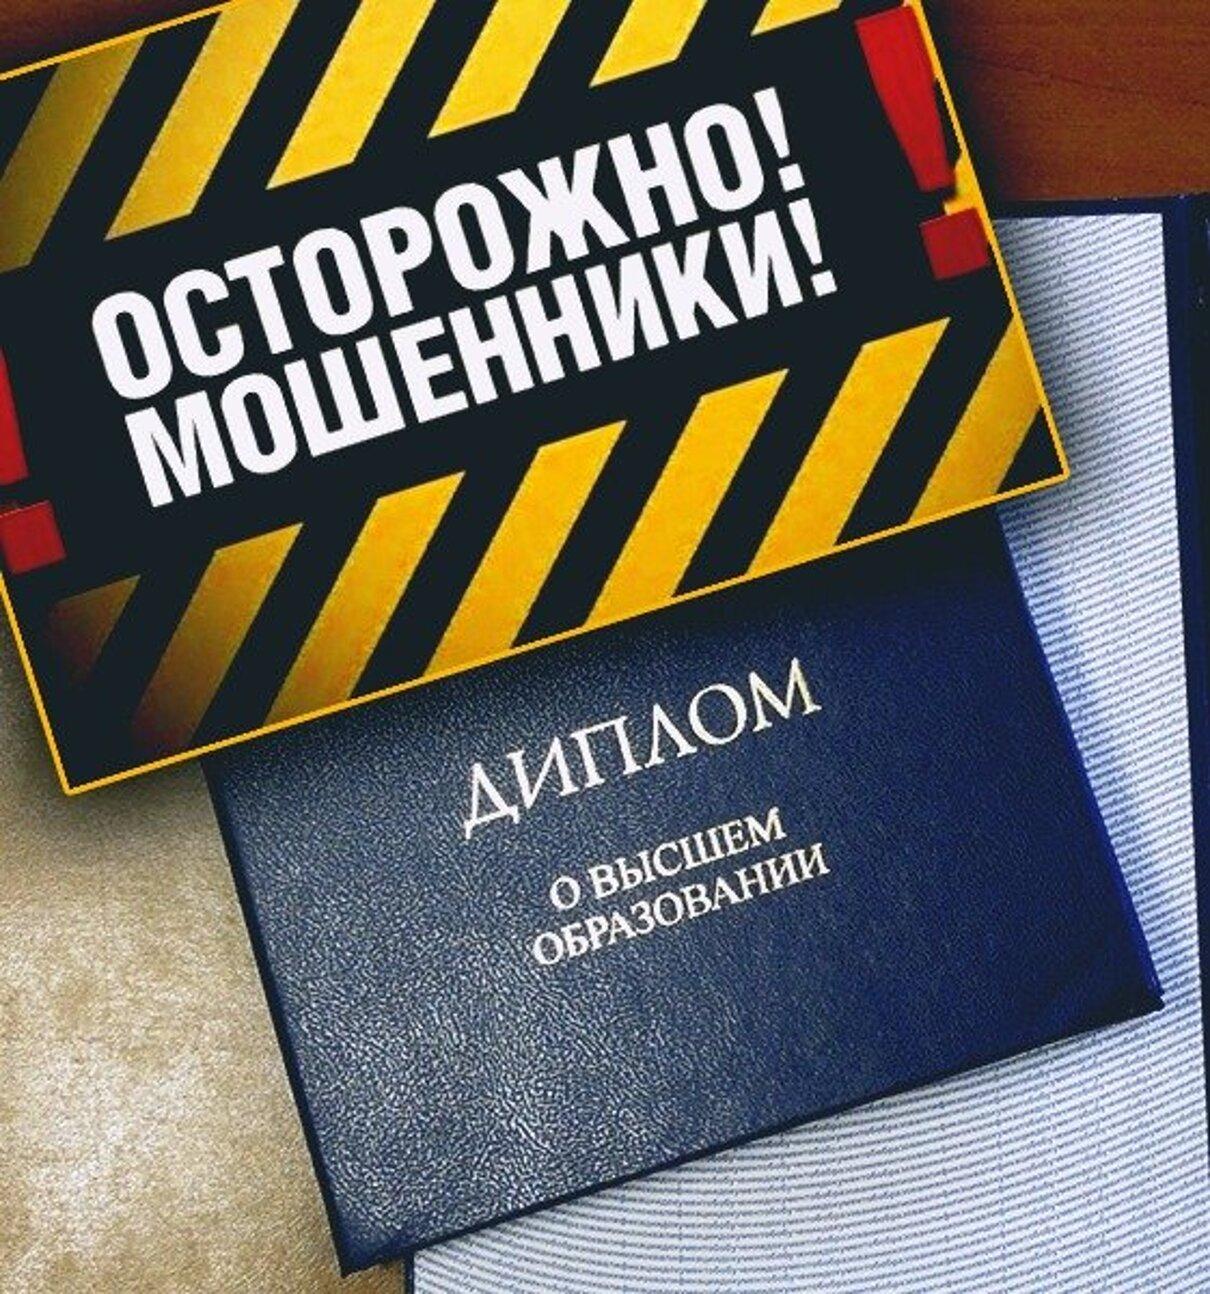 Жалоба-отзыв: Diplommaker.com - Мошенники +7 (926) 769-52-06, info@diplommaker.com.  Фото №1